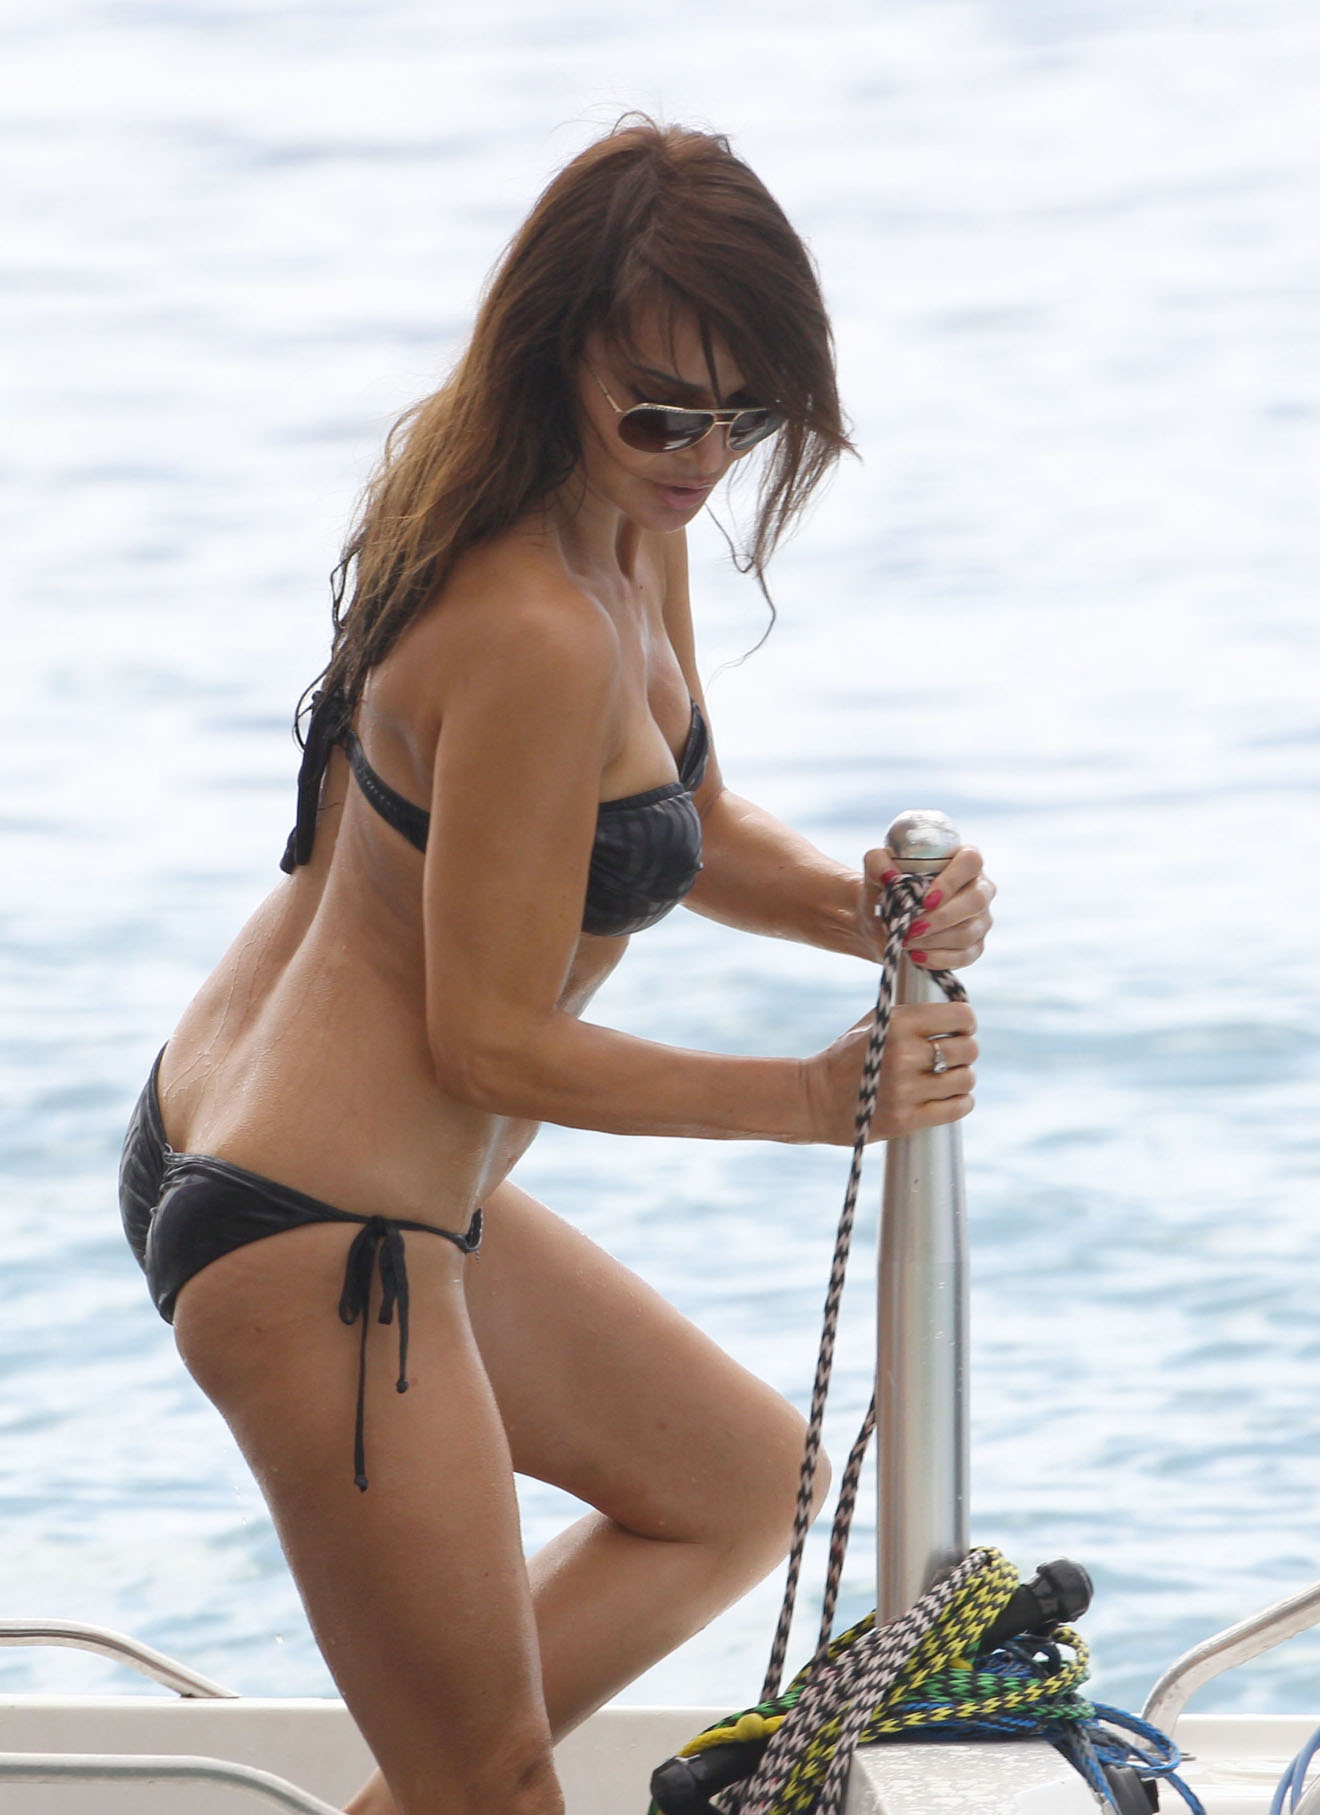 Bikini Lizzie Cundy nudes (67 photo), Topless, Fappening, Selfie, cameltoe 2015